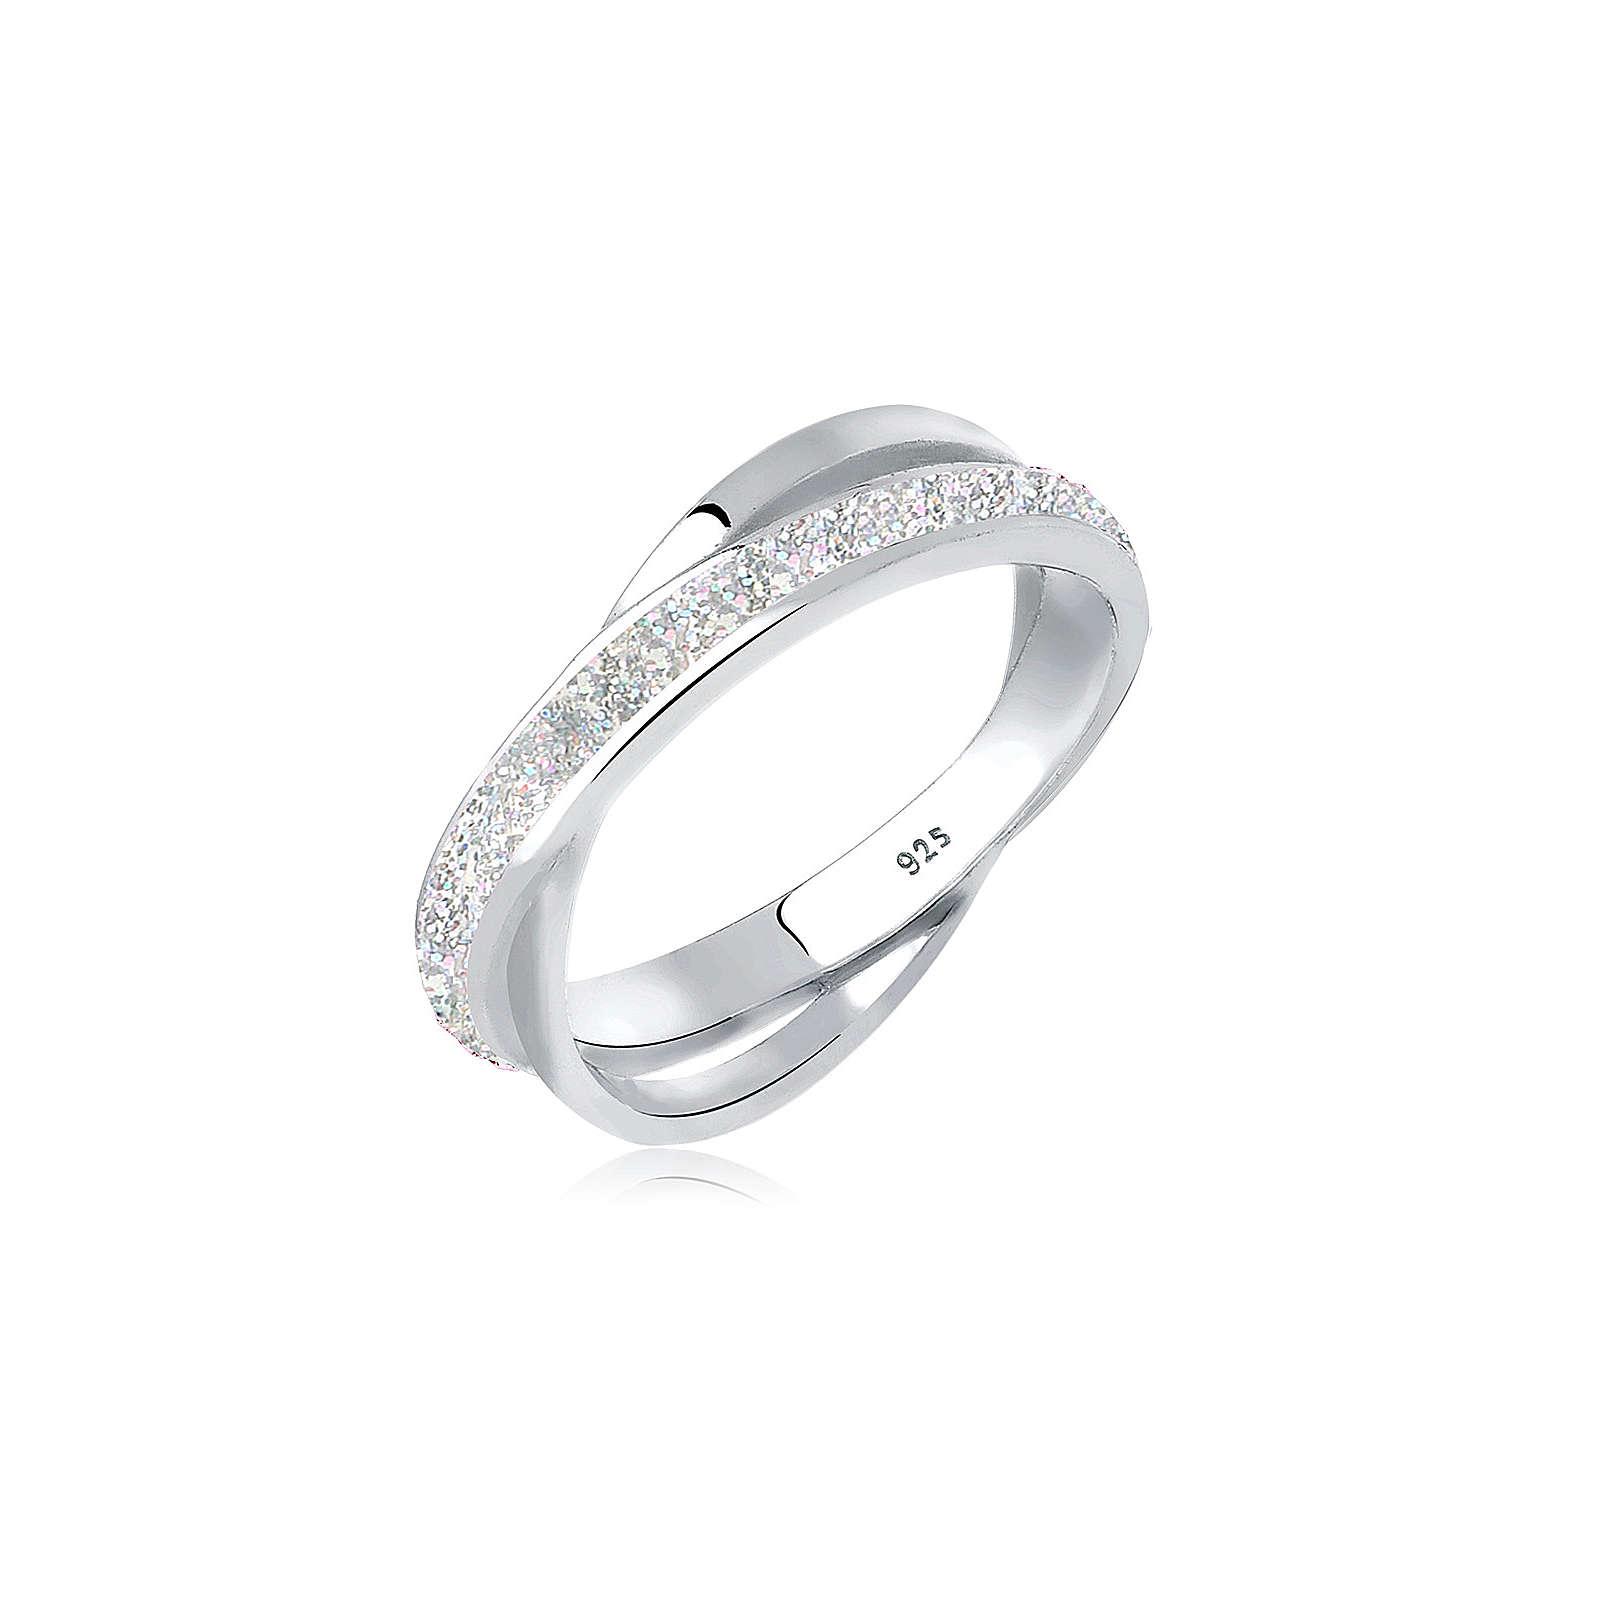 Elli Ring silber Damen Gr. 62